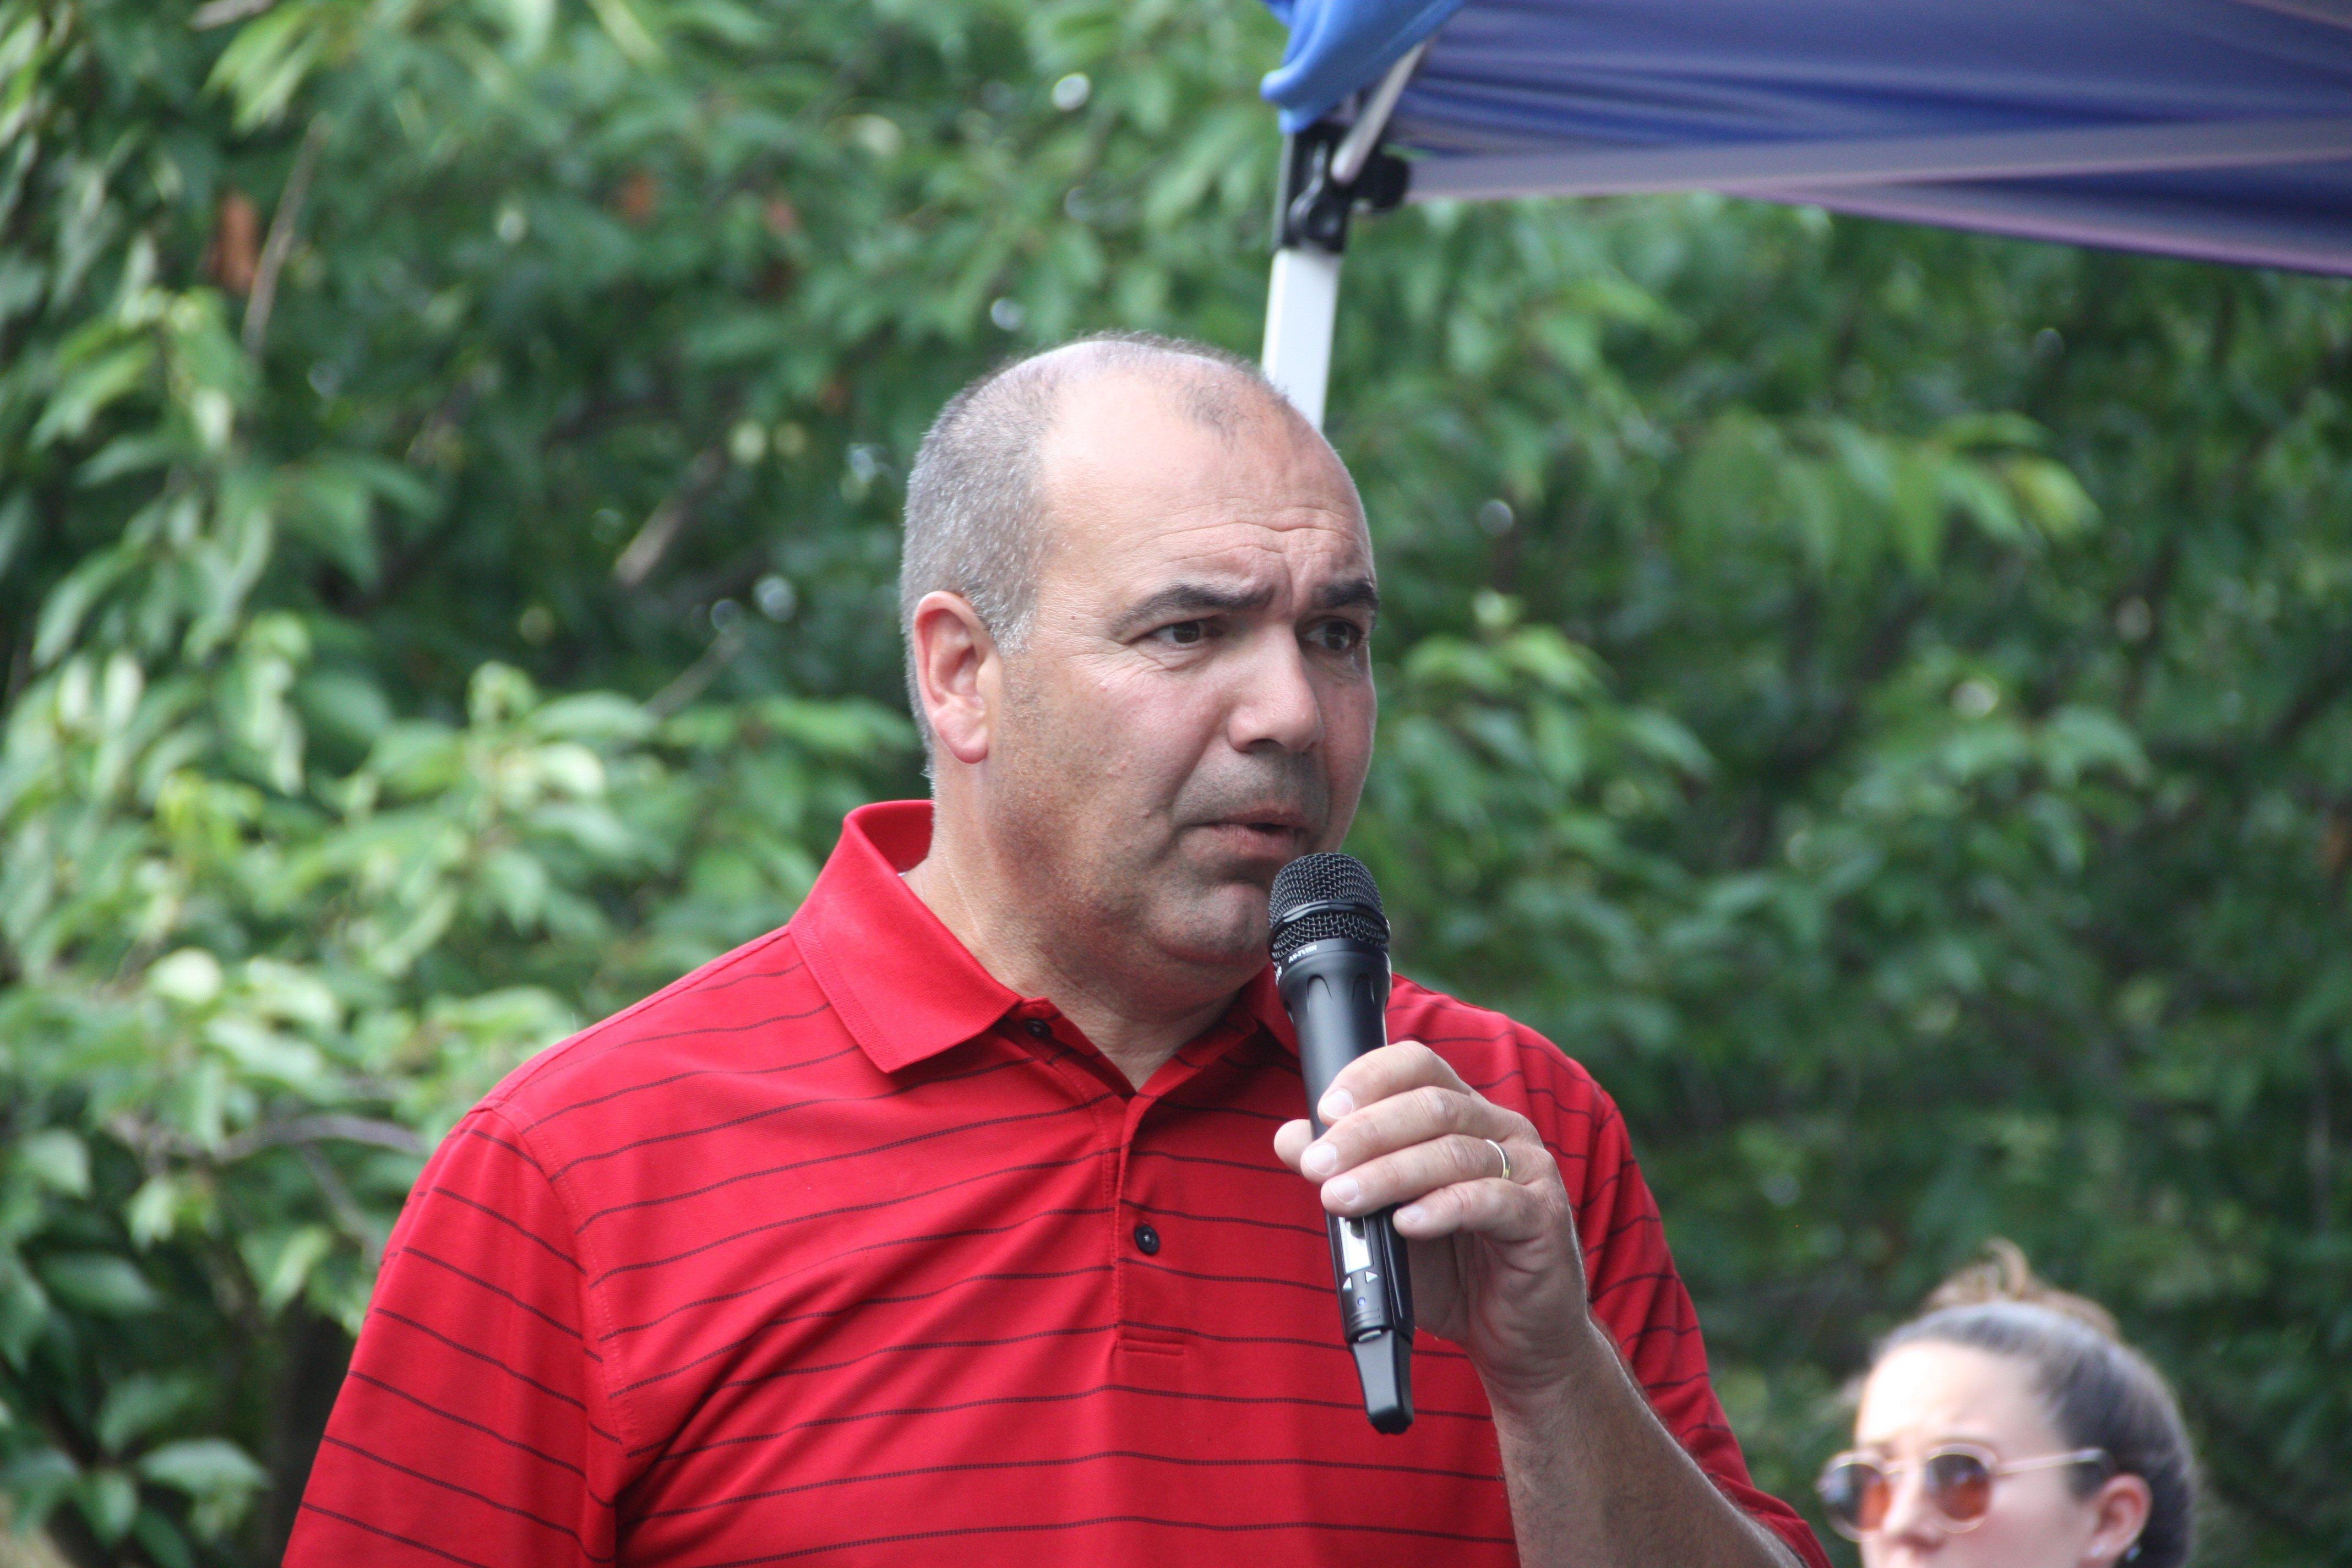 Park and Recreation Director Steve Carvalho